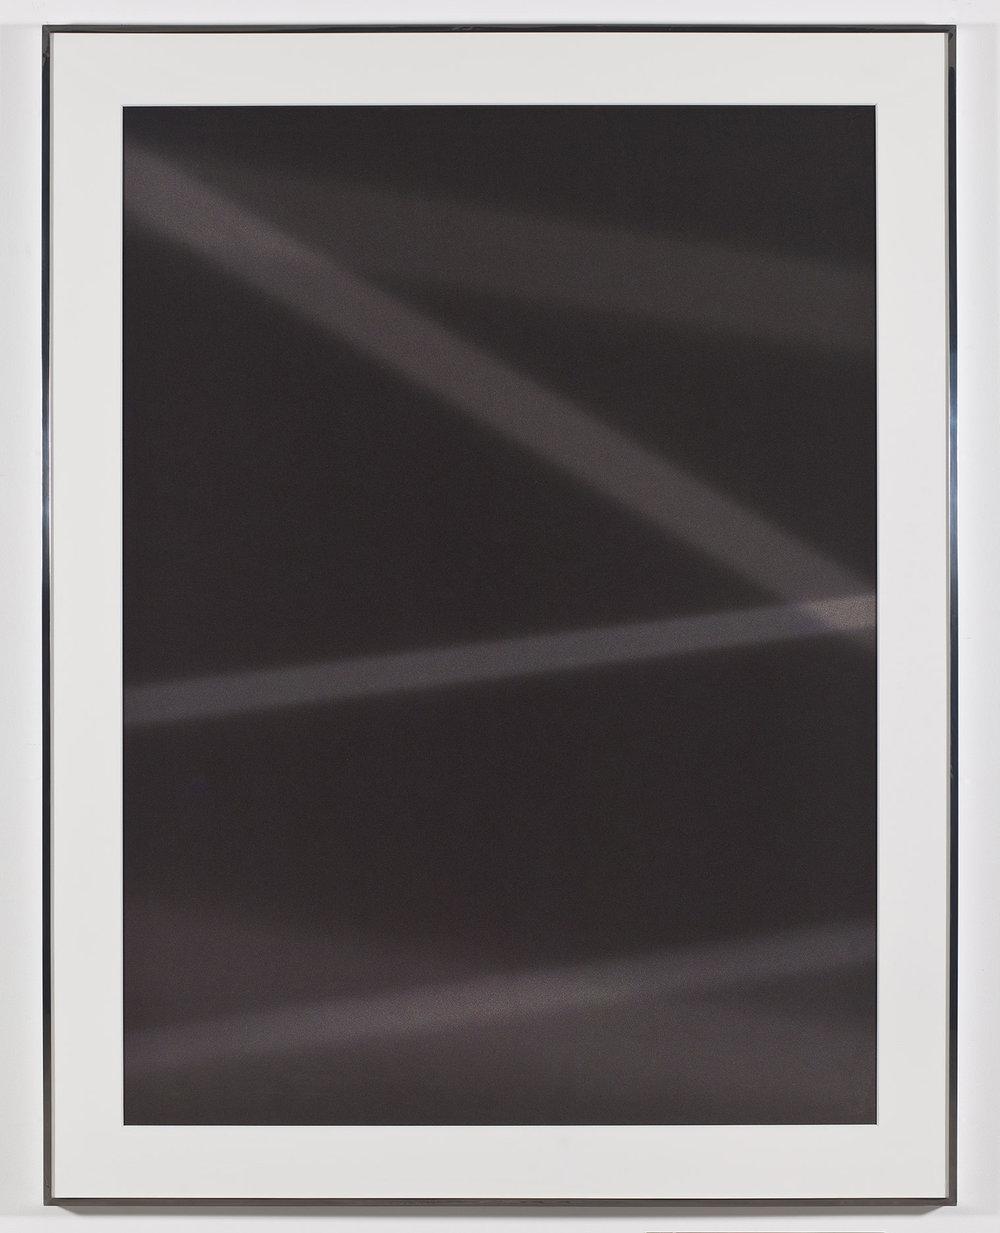 Transparency (Negative) [Kodak Portra 160NC Em. No. 3161: November 28–30, 2010 LAX/MIA MIA/LAX]   2011  Epson Ultrachrome K3 archival ink jet print on Museo Silver Rag Paper  68 x 52 1/4 inches   Transparencies, 2008–2014    Diapositives, 2011